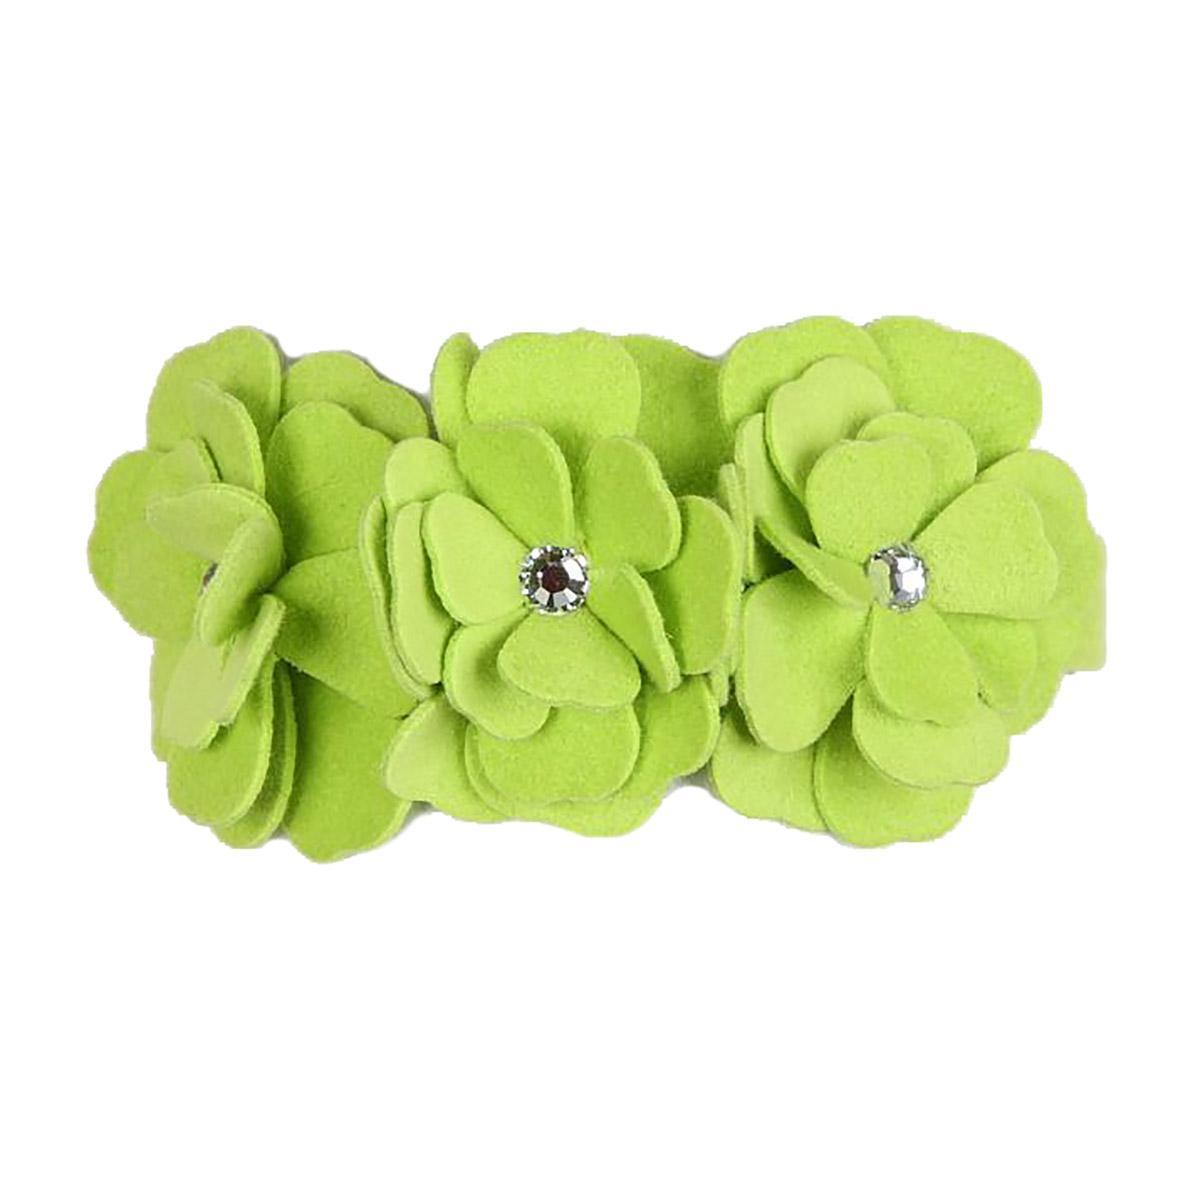 Tinkie's Garden Dog Collar by Susan Lanci - Kiwi